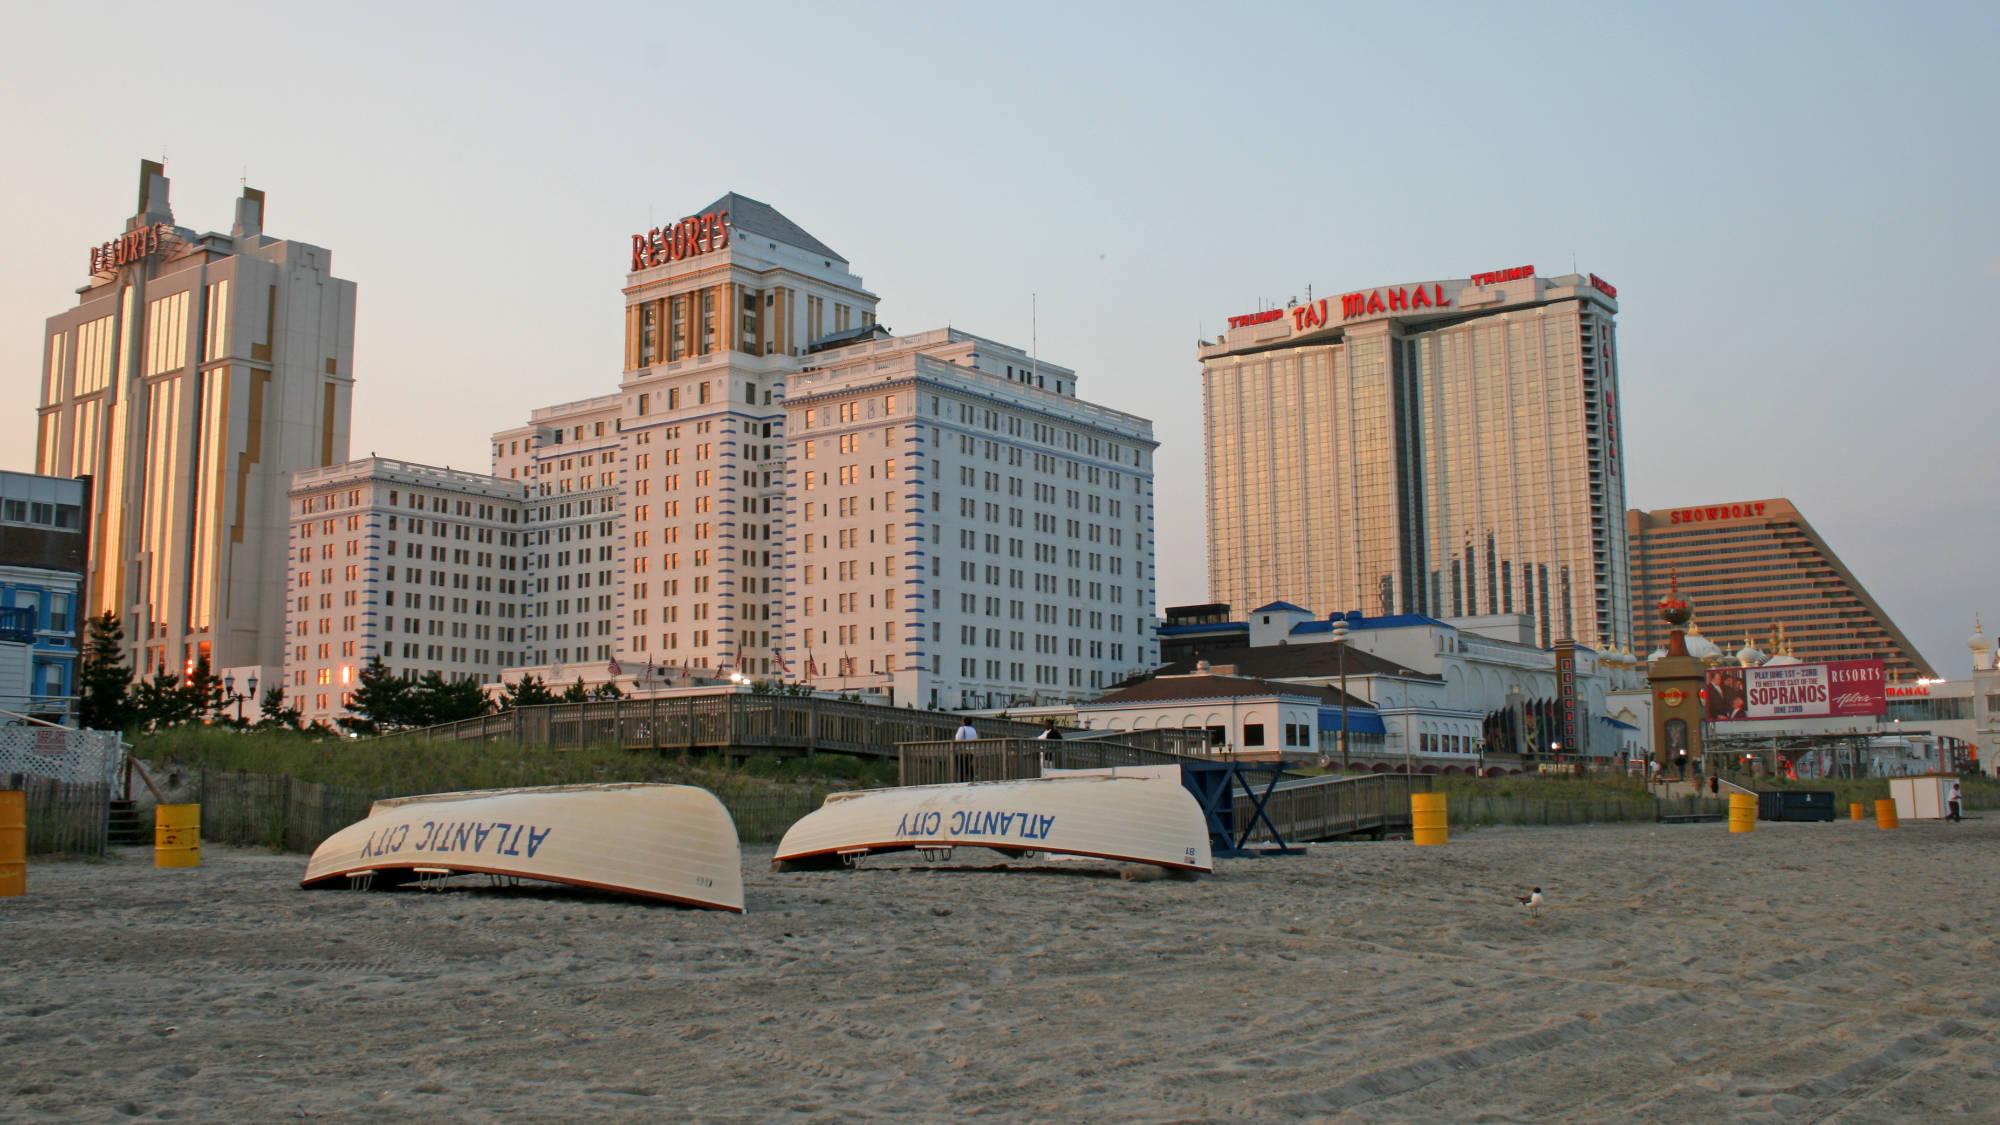 Atlantic City, New Jersey